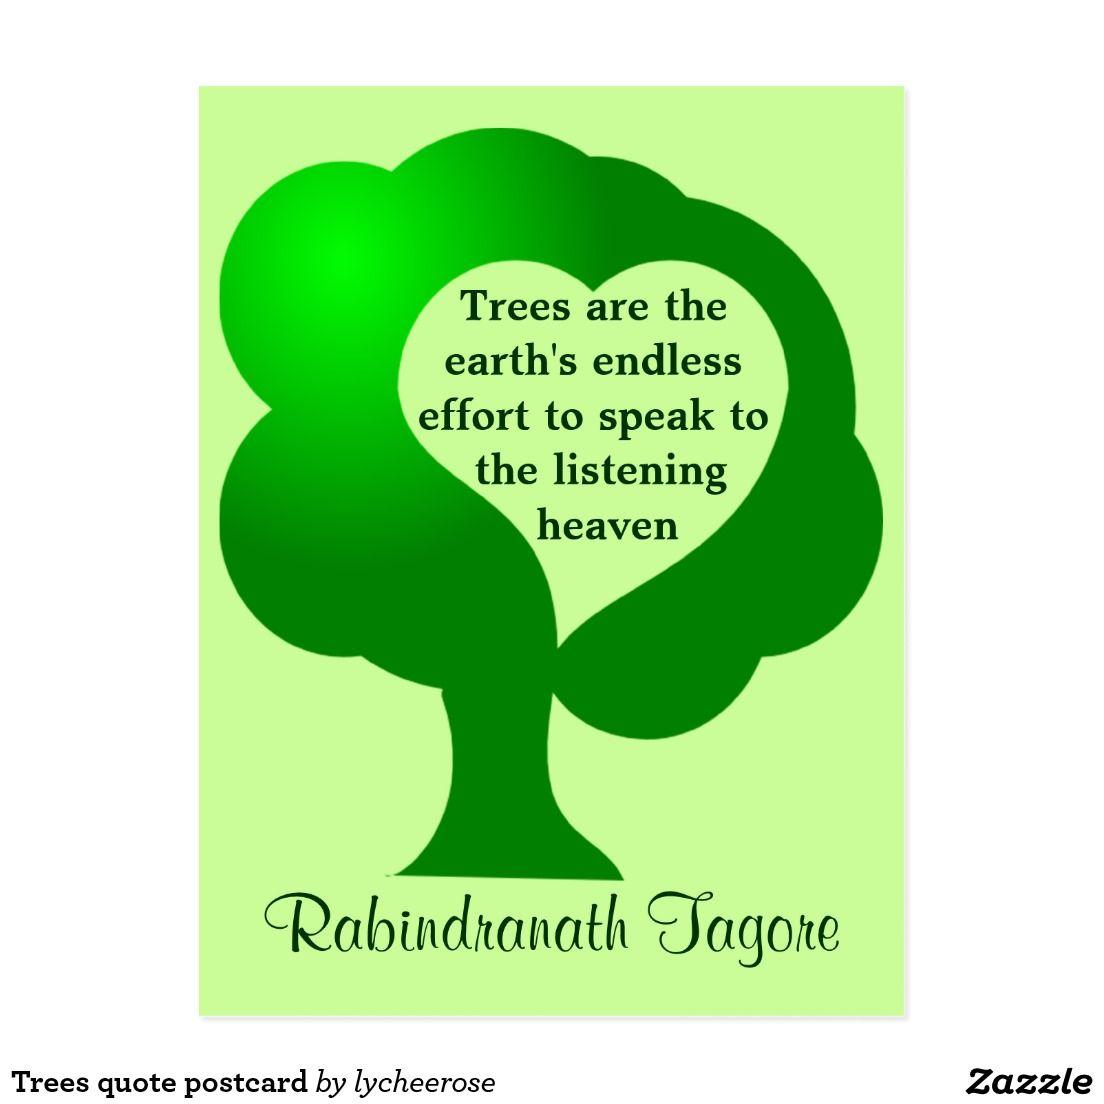 Trees quote postcard